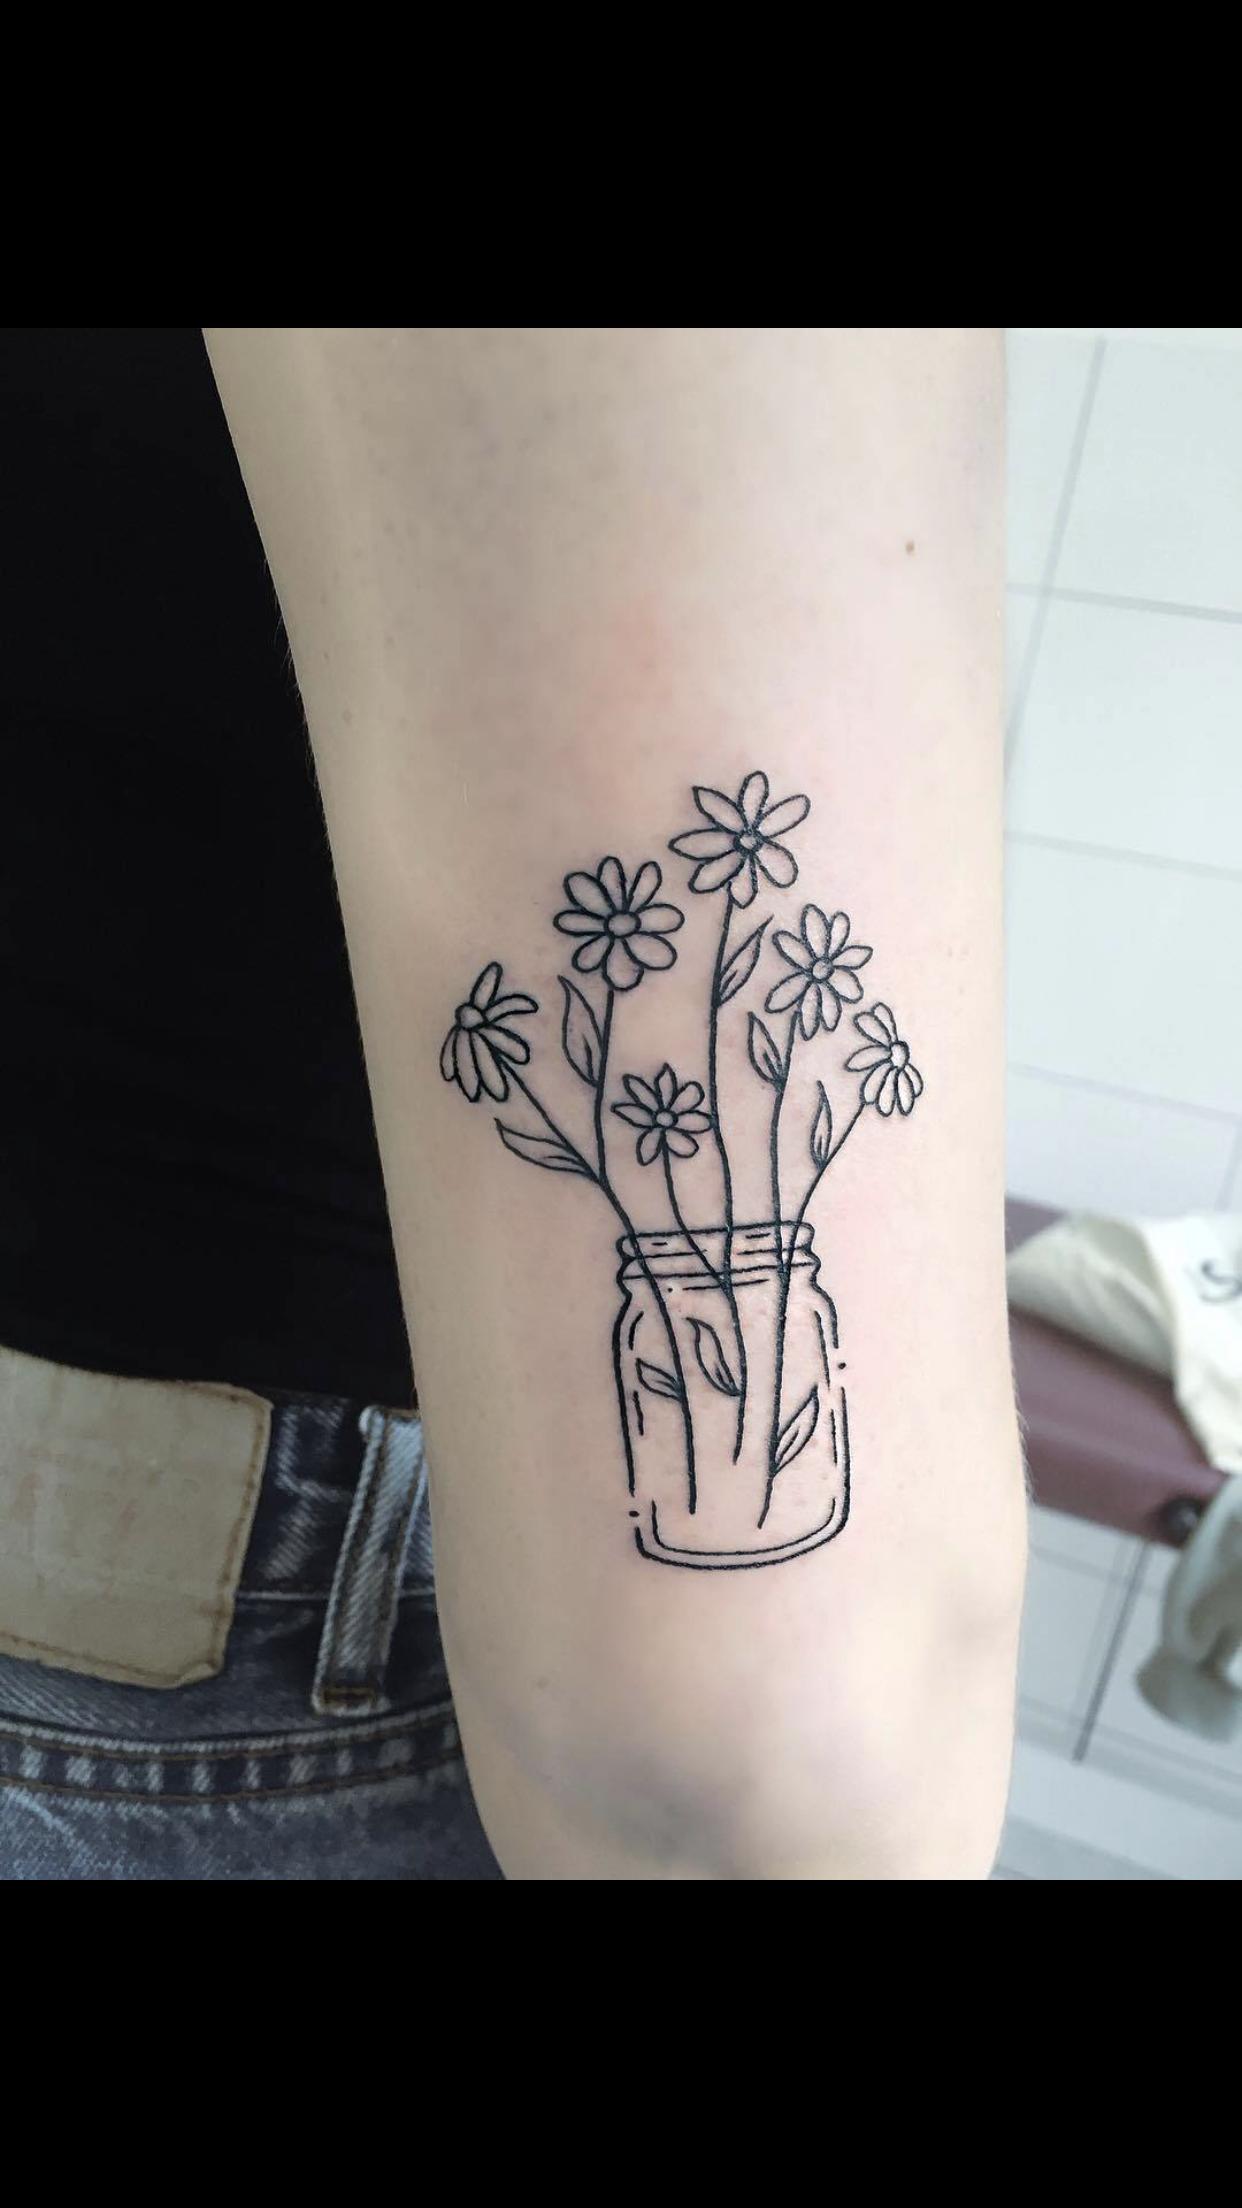 Pin by abigail martinez on Tattoos Daisy tattoo designs